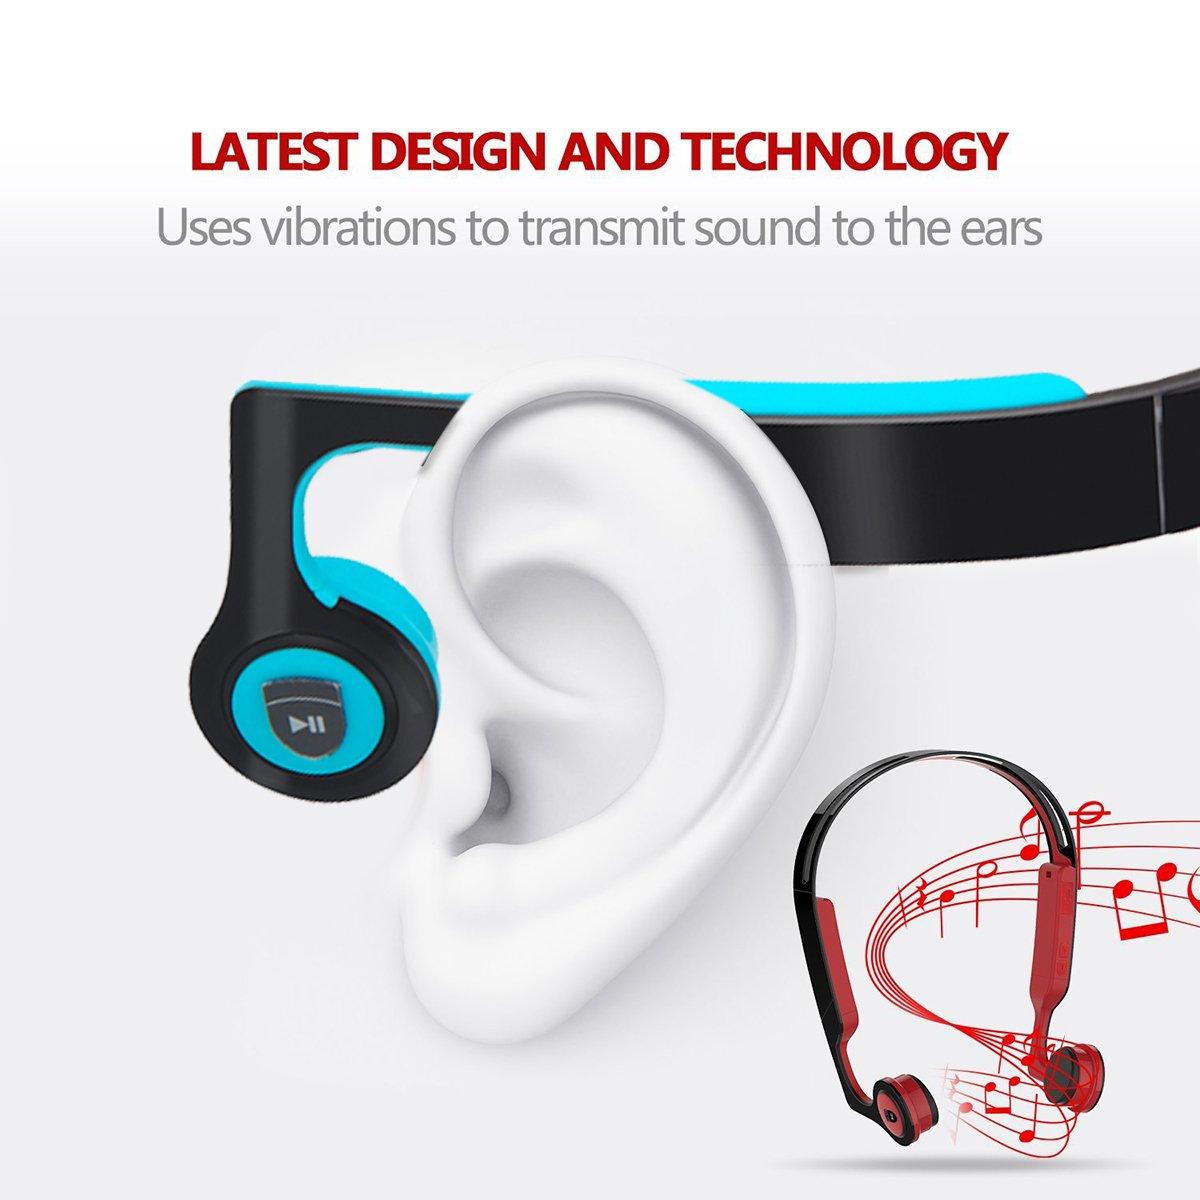 Bone Conduction Headphones,Wireless Headphones Bluetooth 4.2 Stereo Open Eardrum Headphones Waterproof for Sports Driving Running Driving,Sweatproof Waterproof